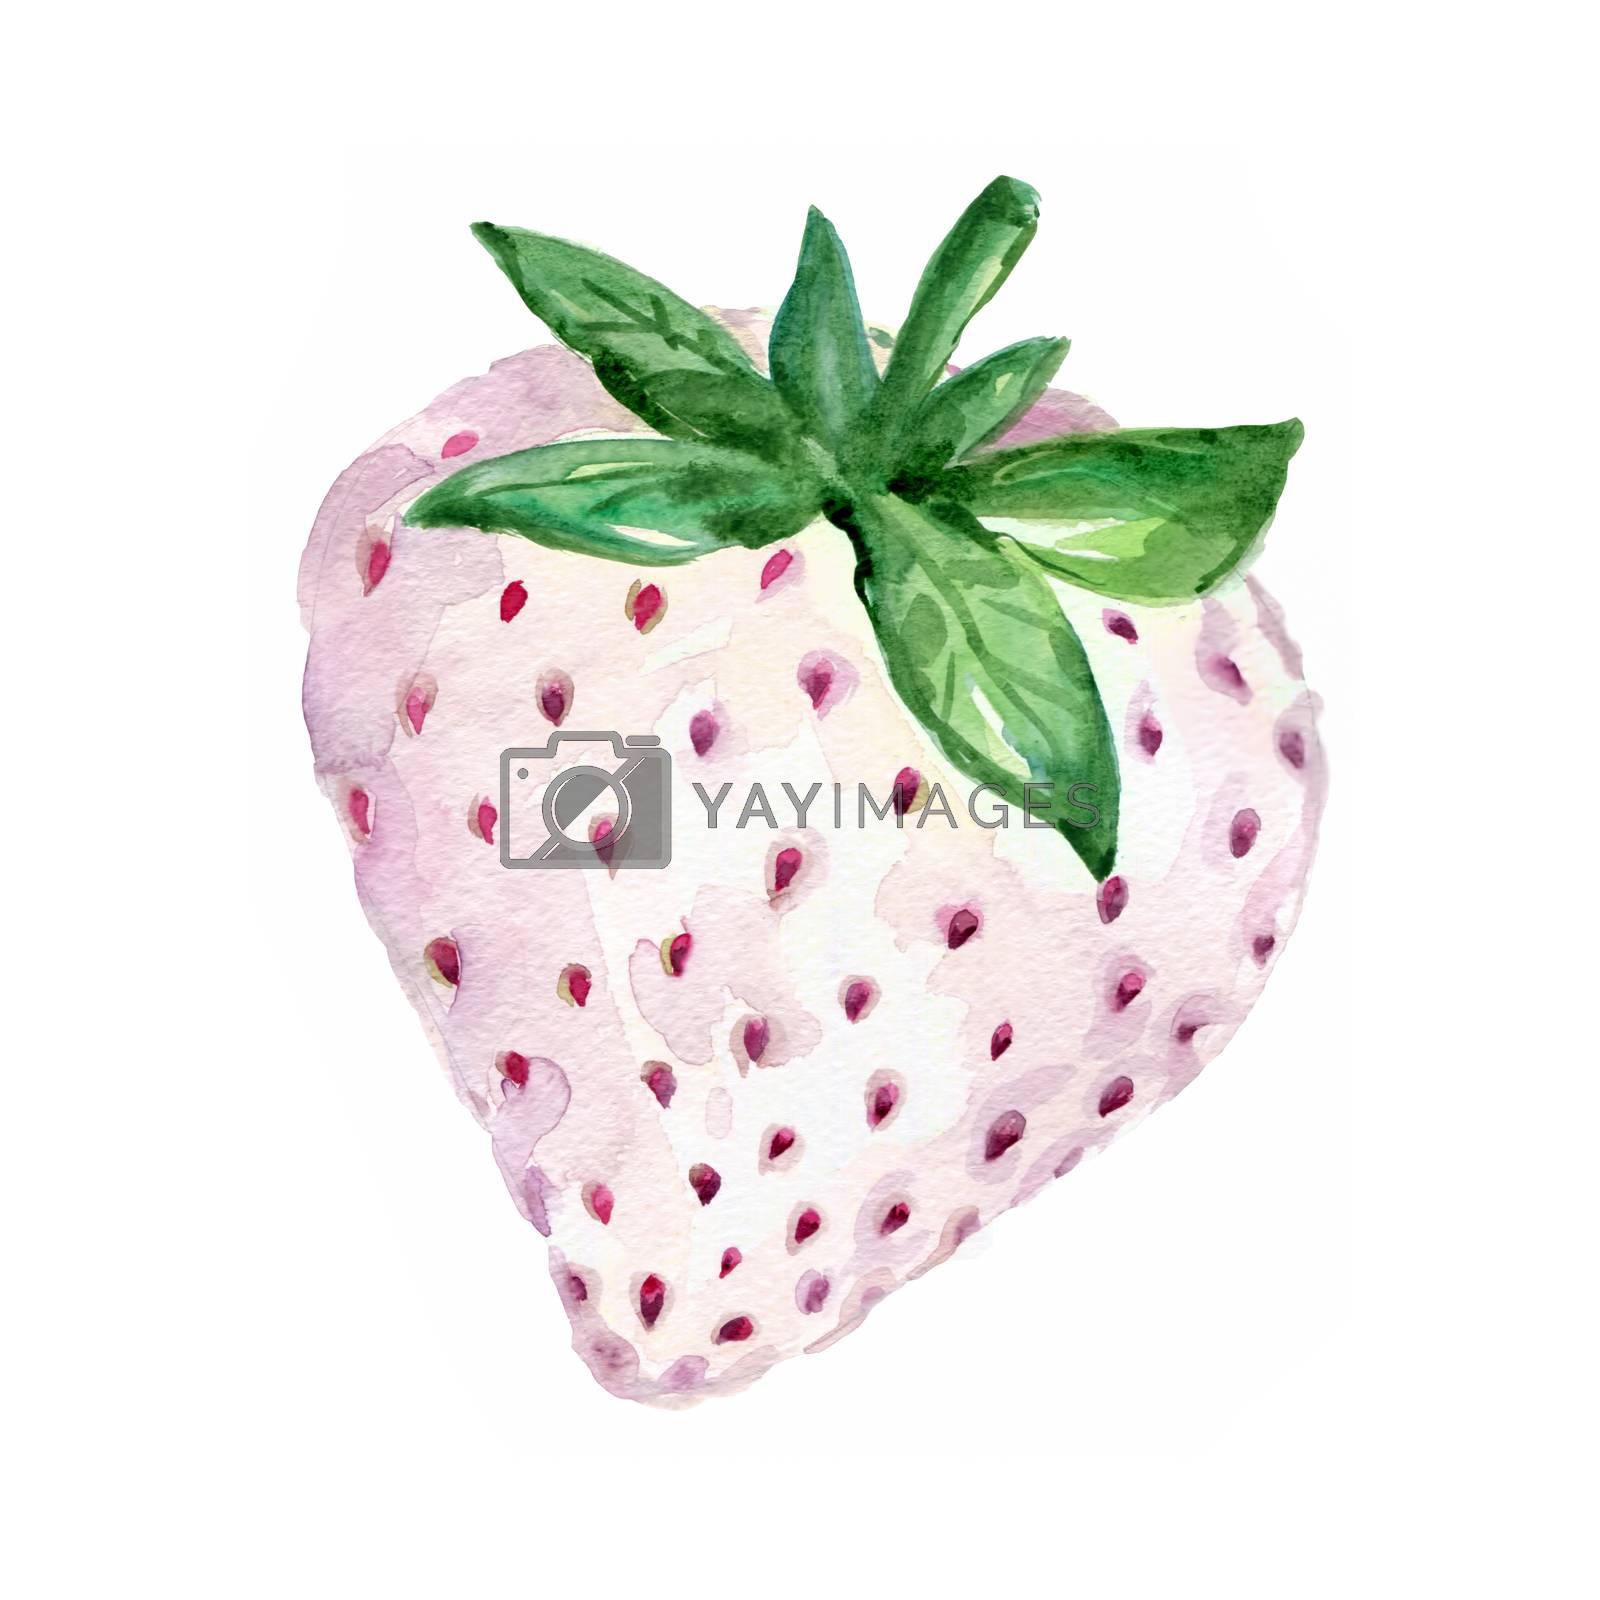 Watercolor White Strawberry. Hand Drawn Illustration Organic Food Vegetarian Ingredient